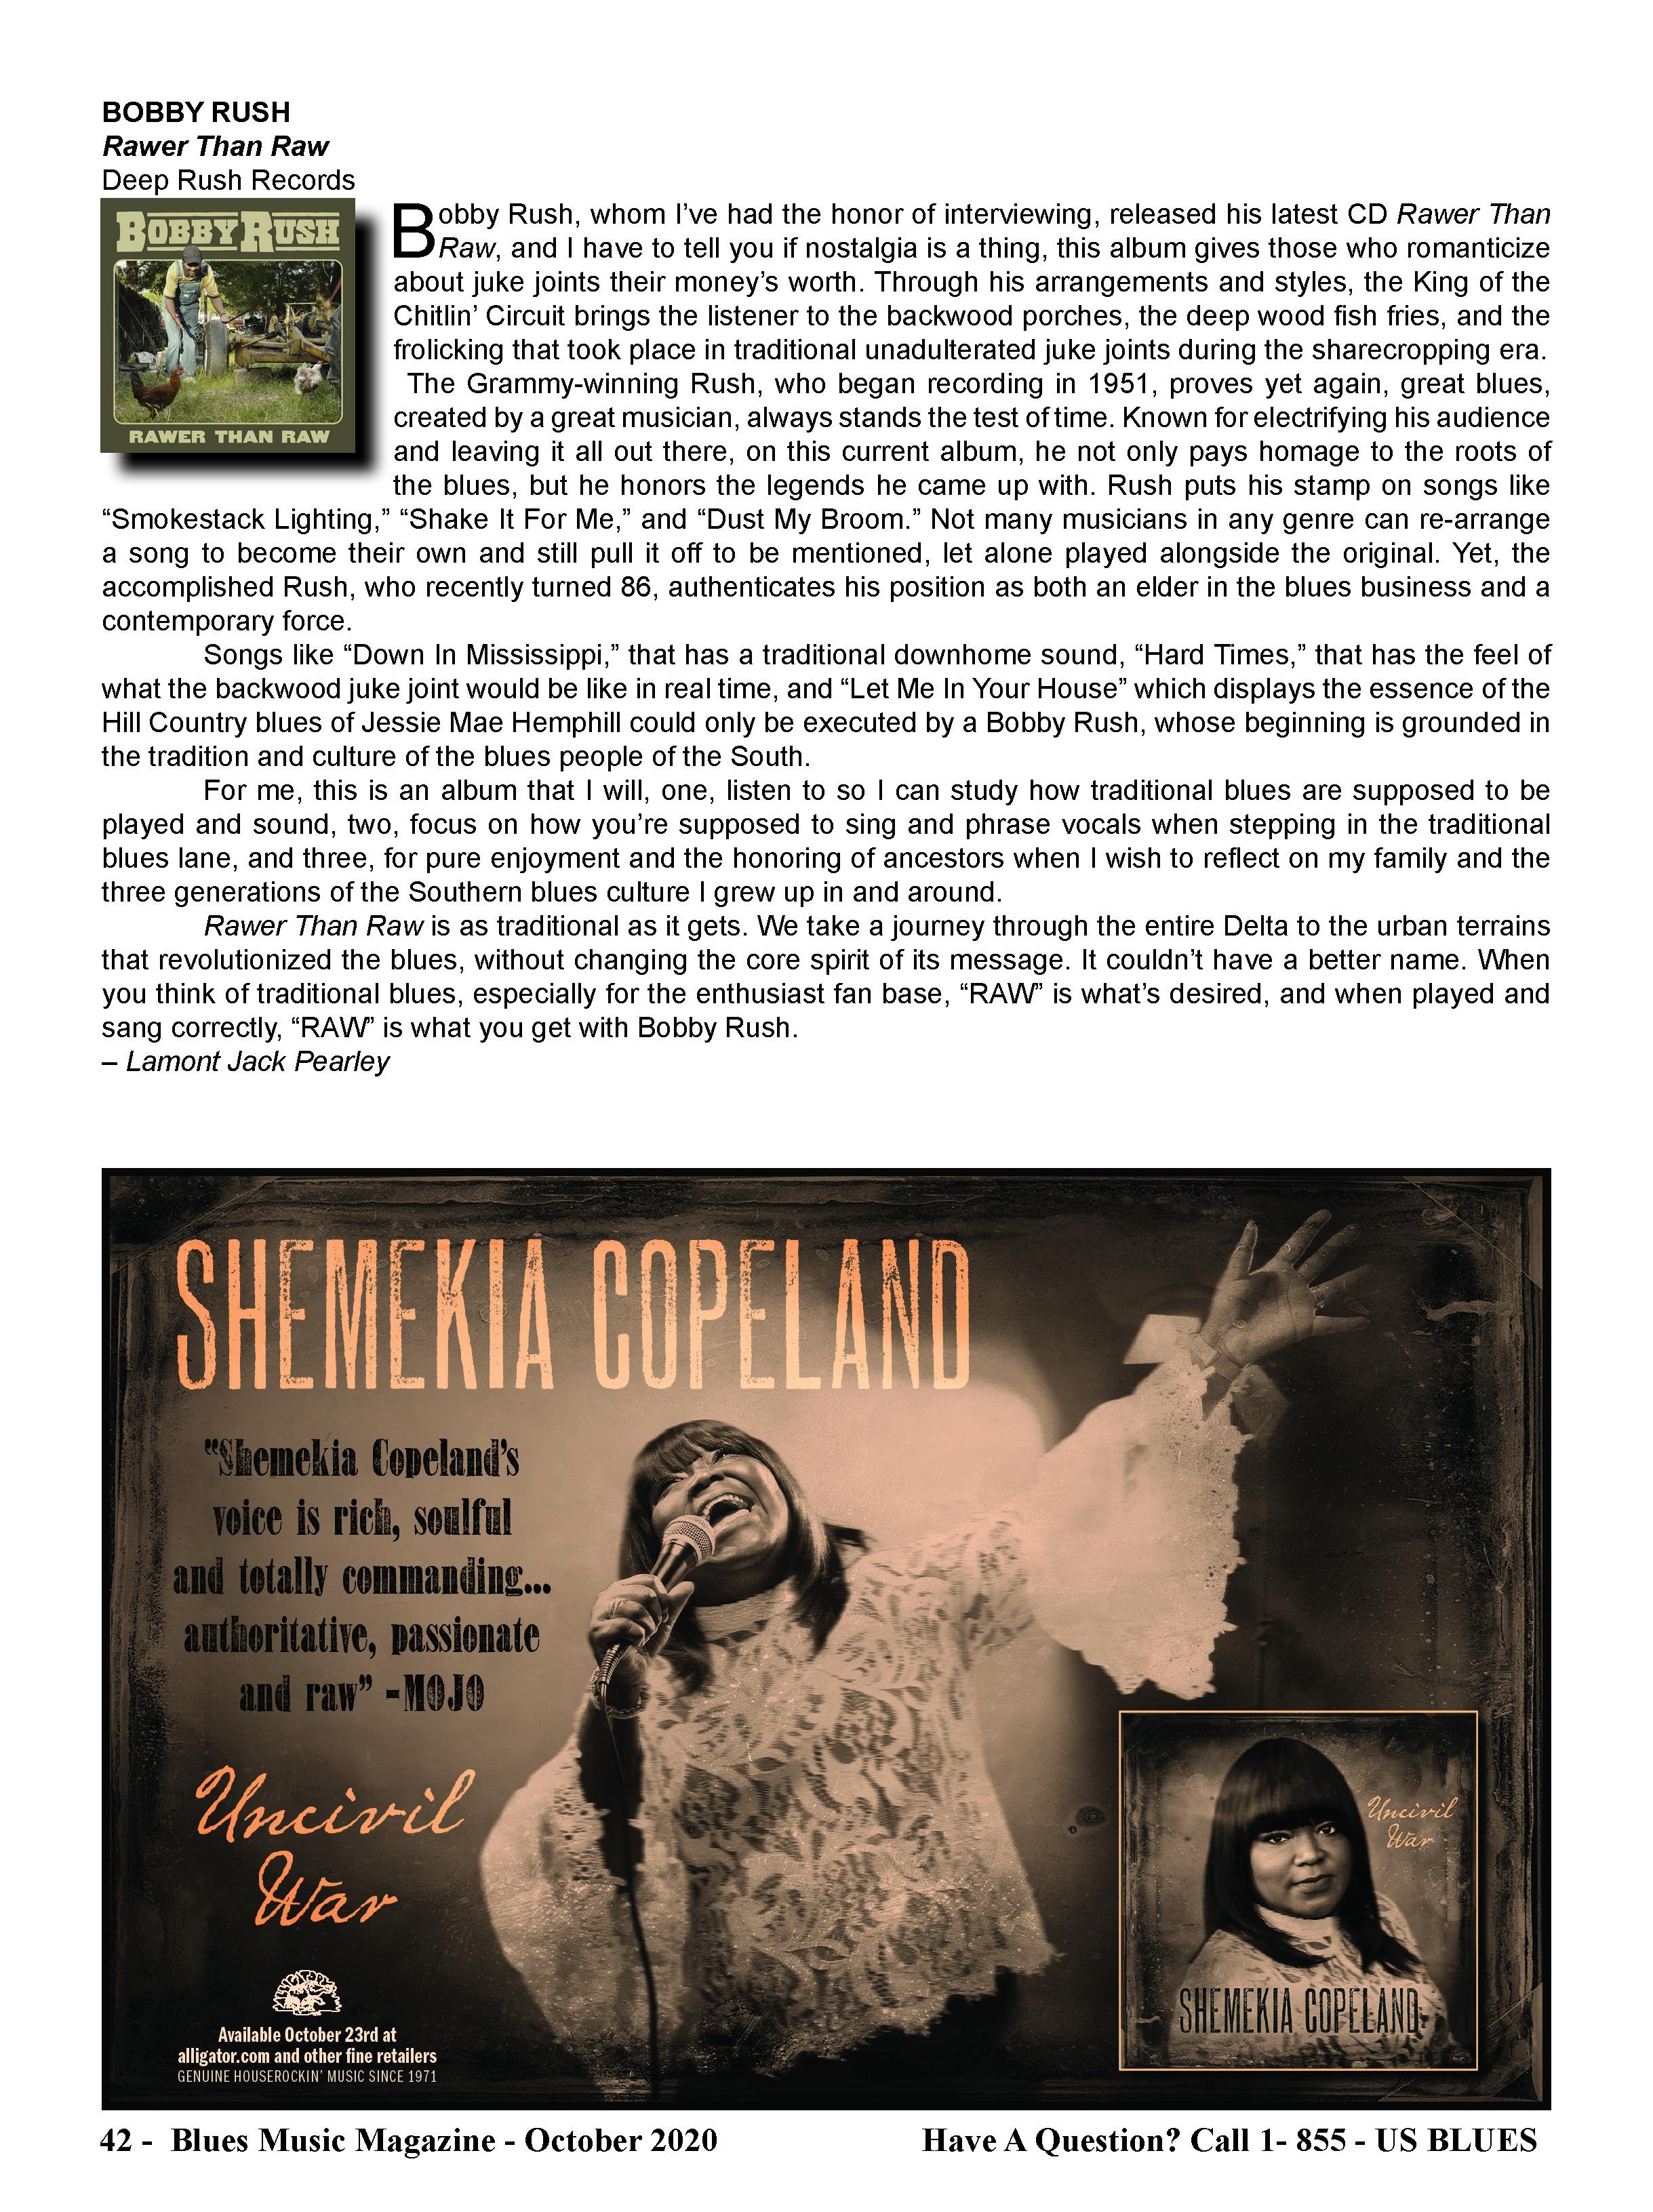 blues-music-magazine-fall-2020-2742.jpg